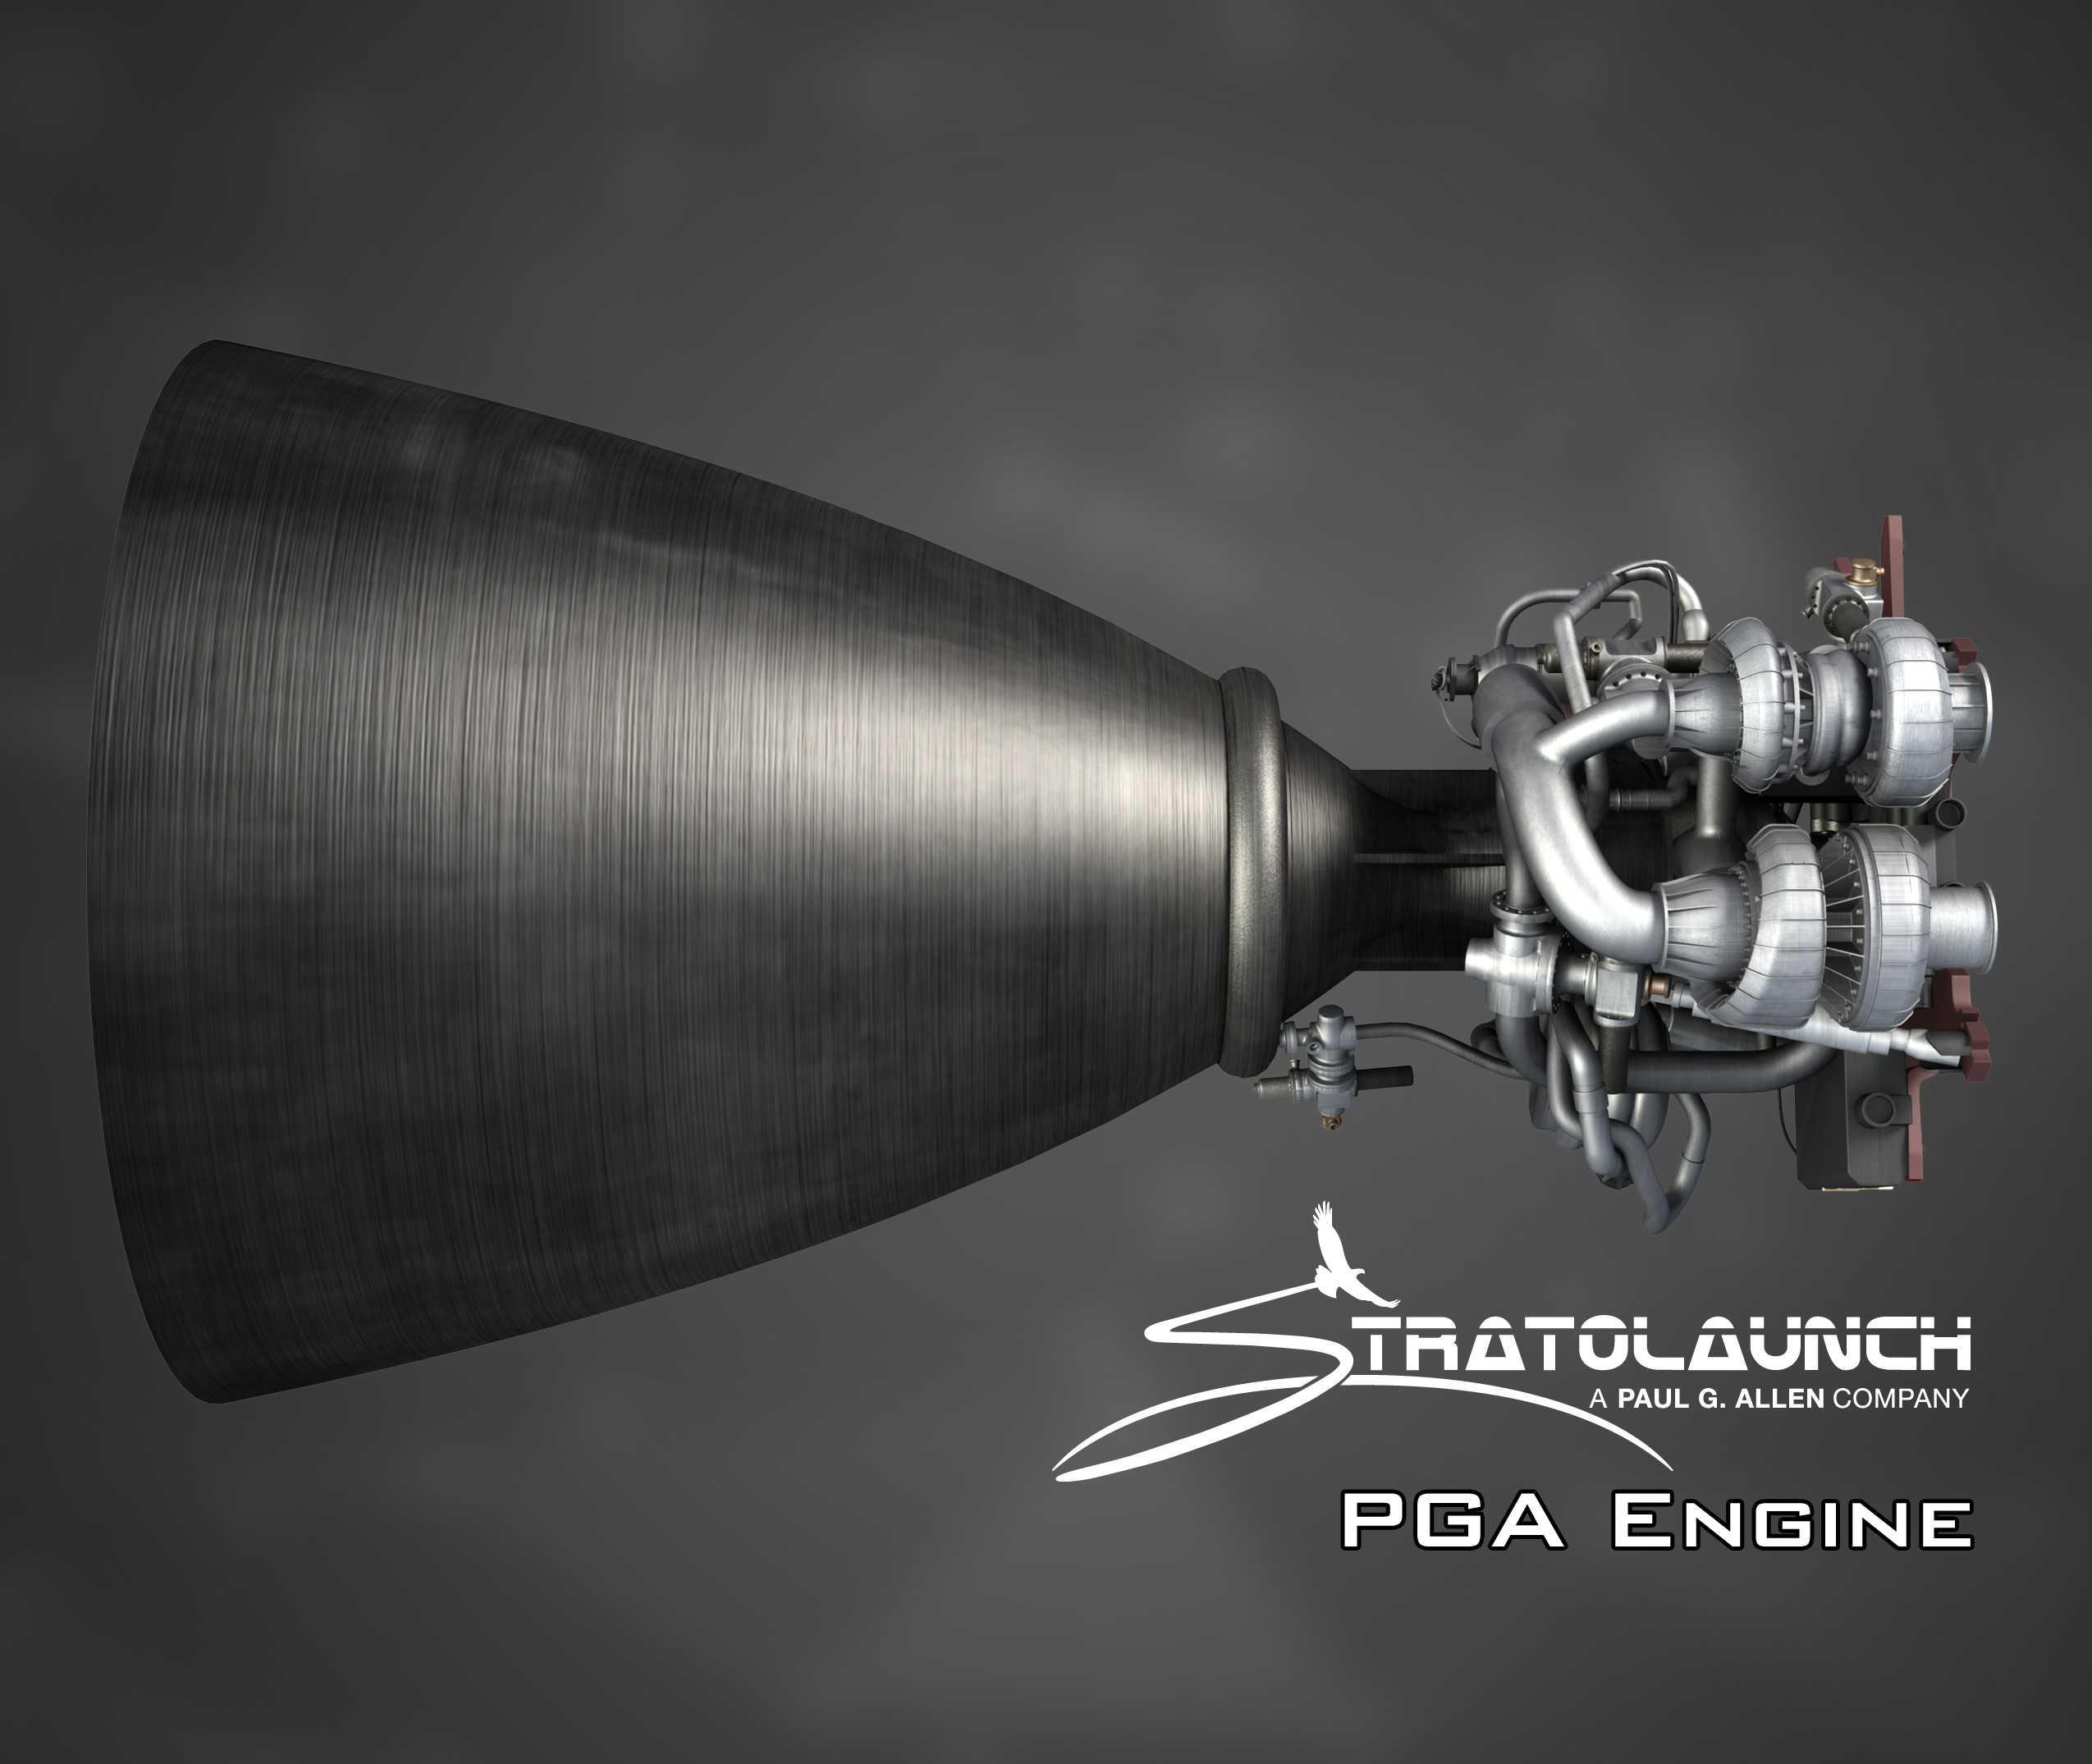 PGA hydrolox engine (Stratolaunch) 1(c)